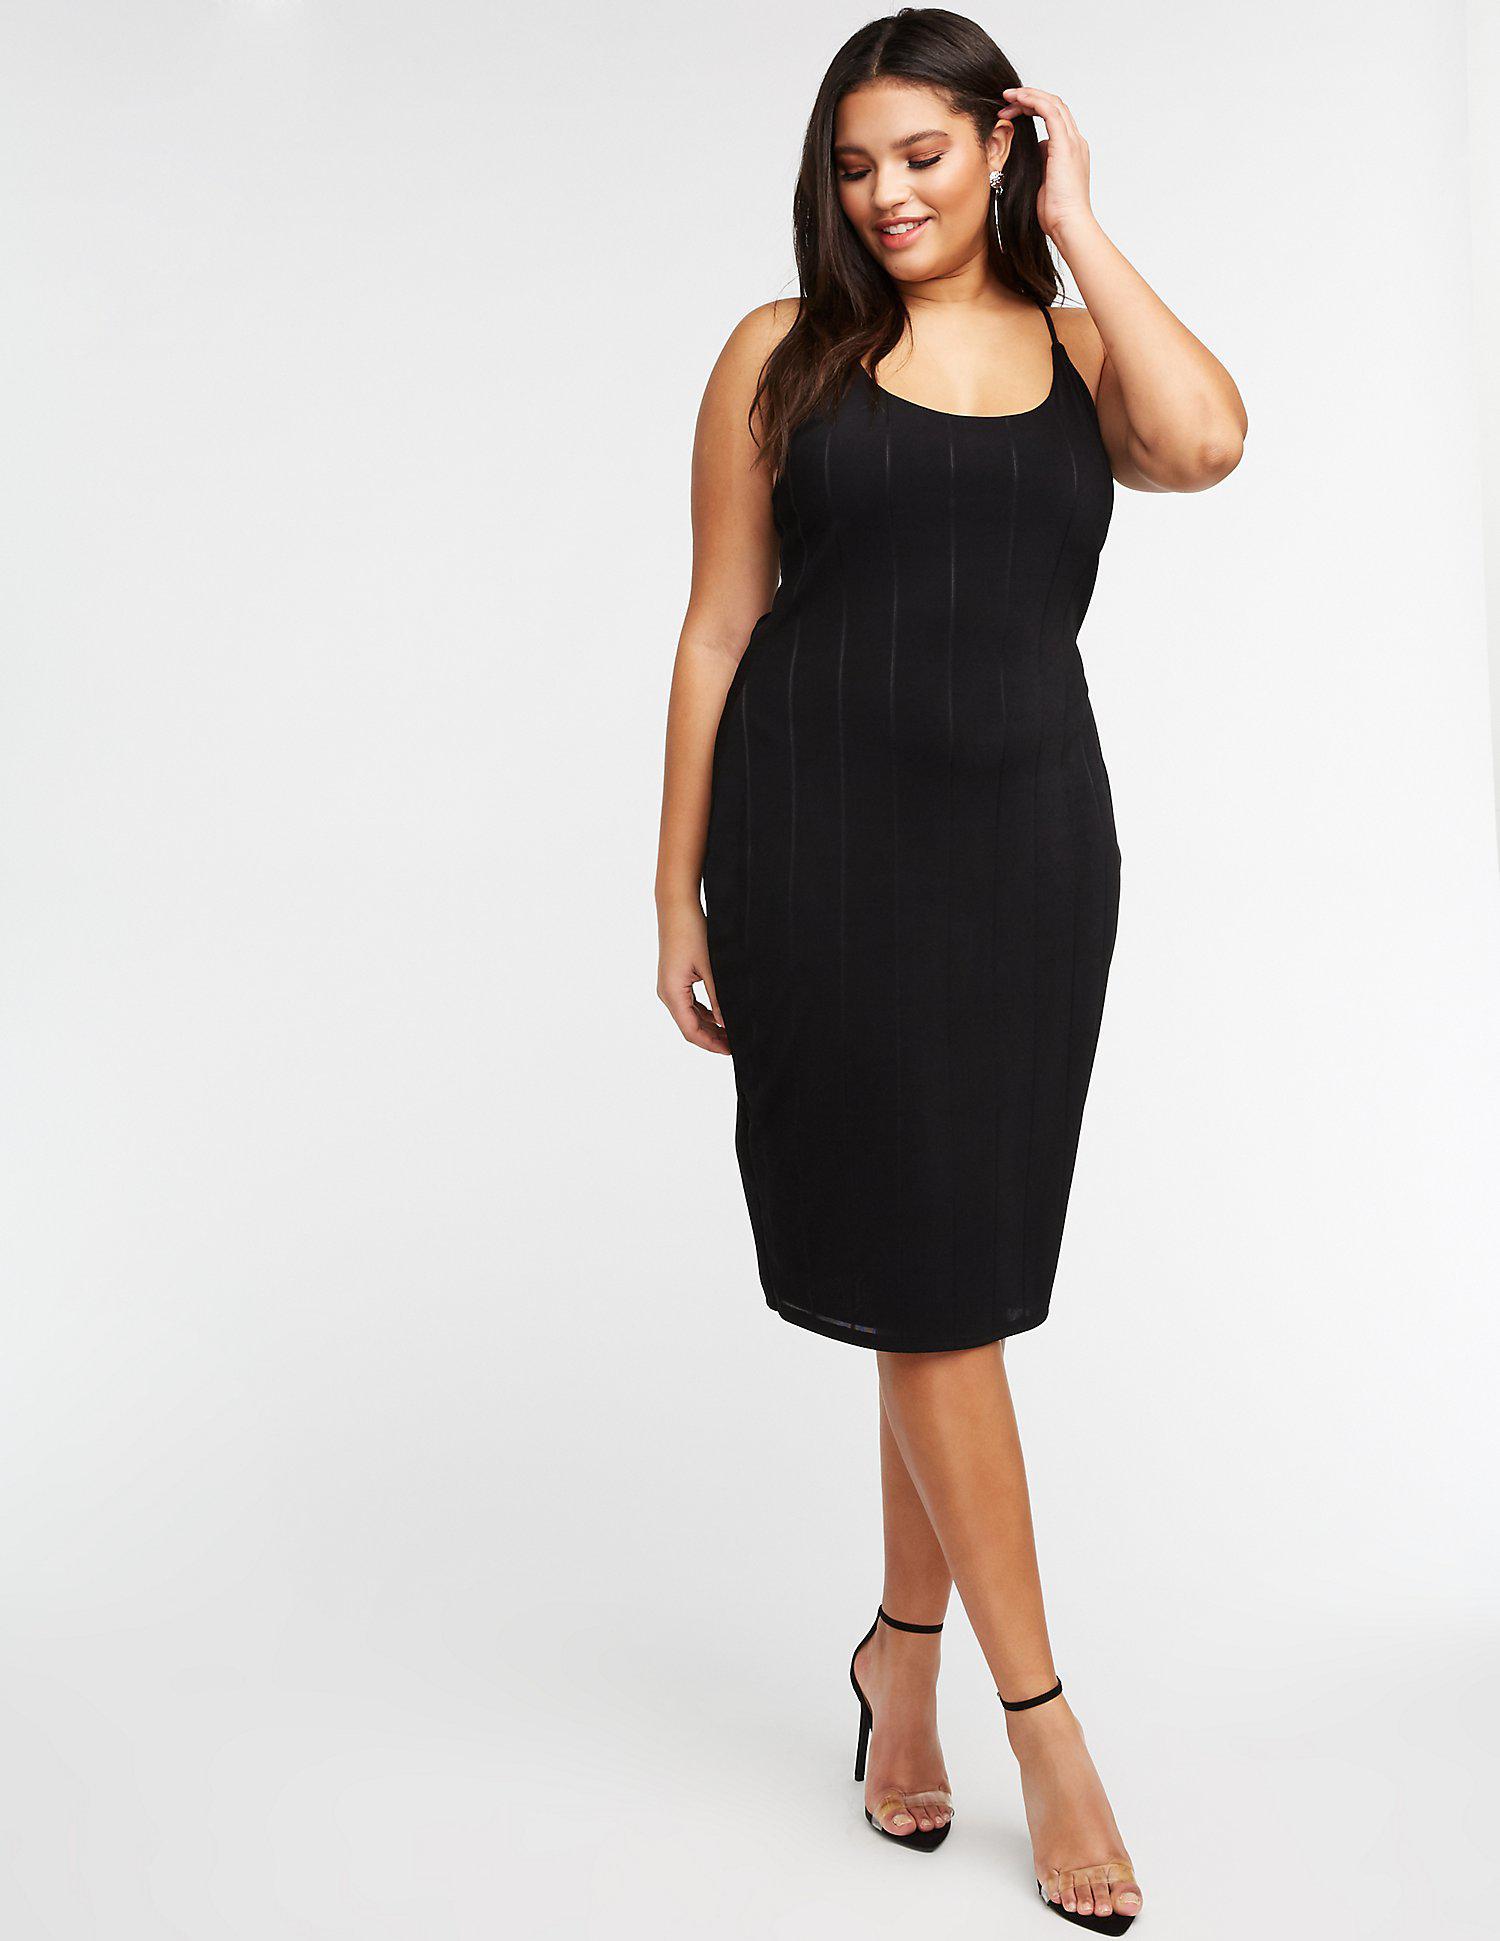 ee8b08f1fa Lyst - Charlotte Russe Plus Size Scoop Neck Midi Dress in Black